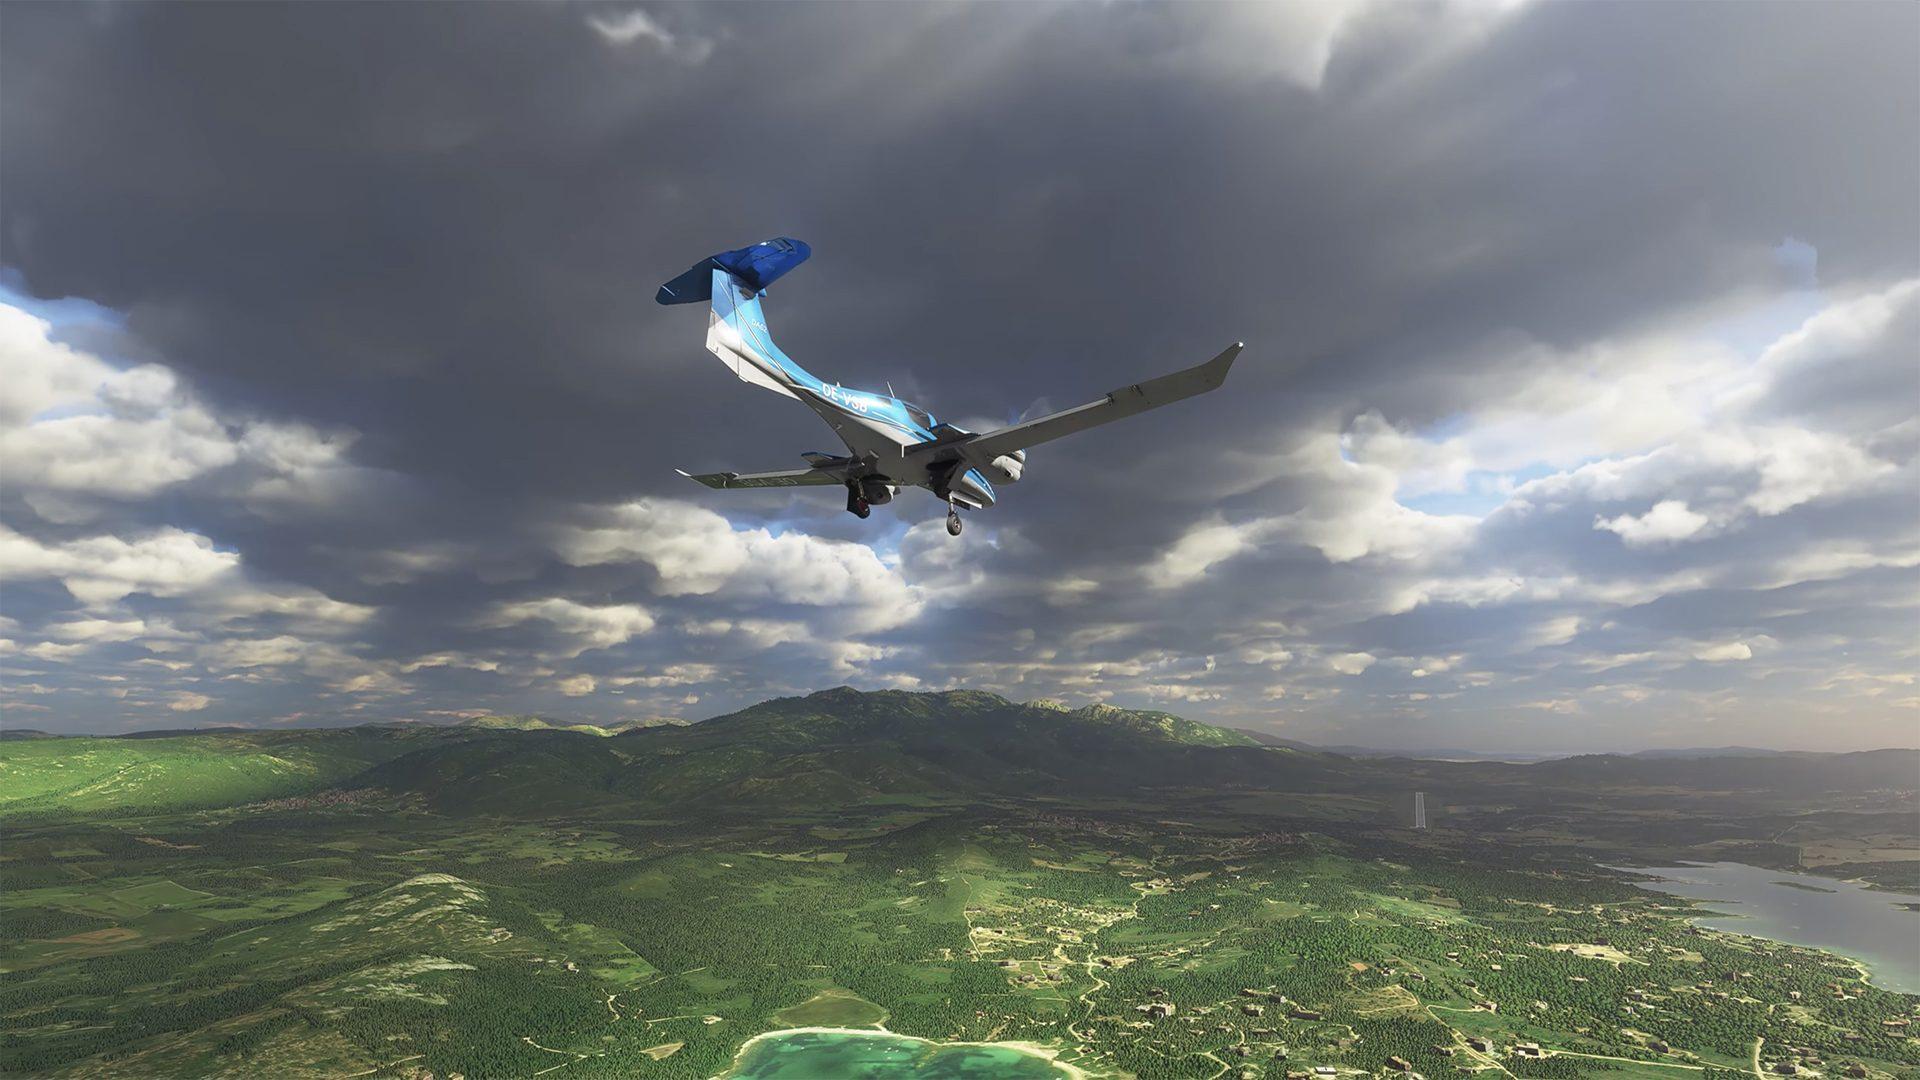 flightsim_screen1